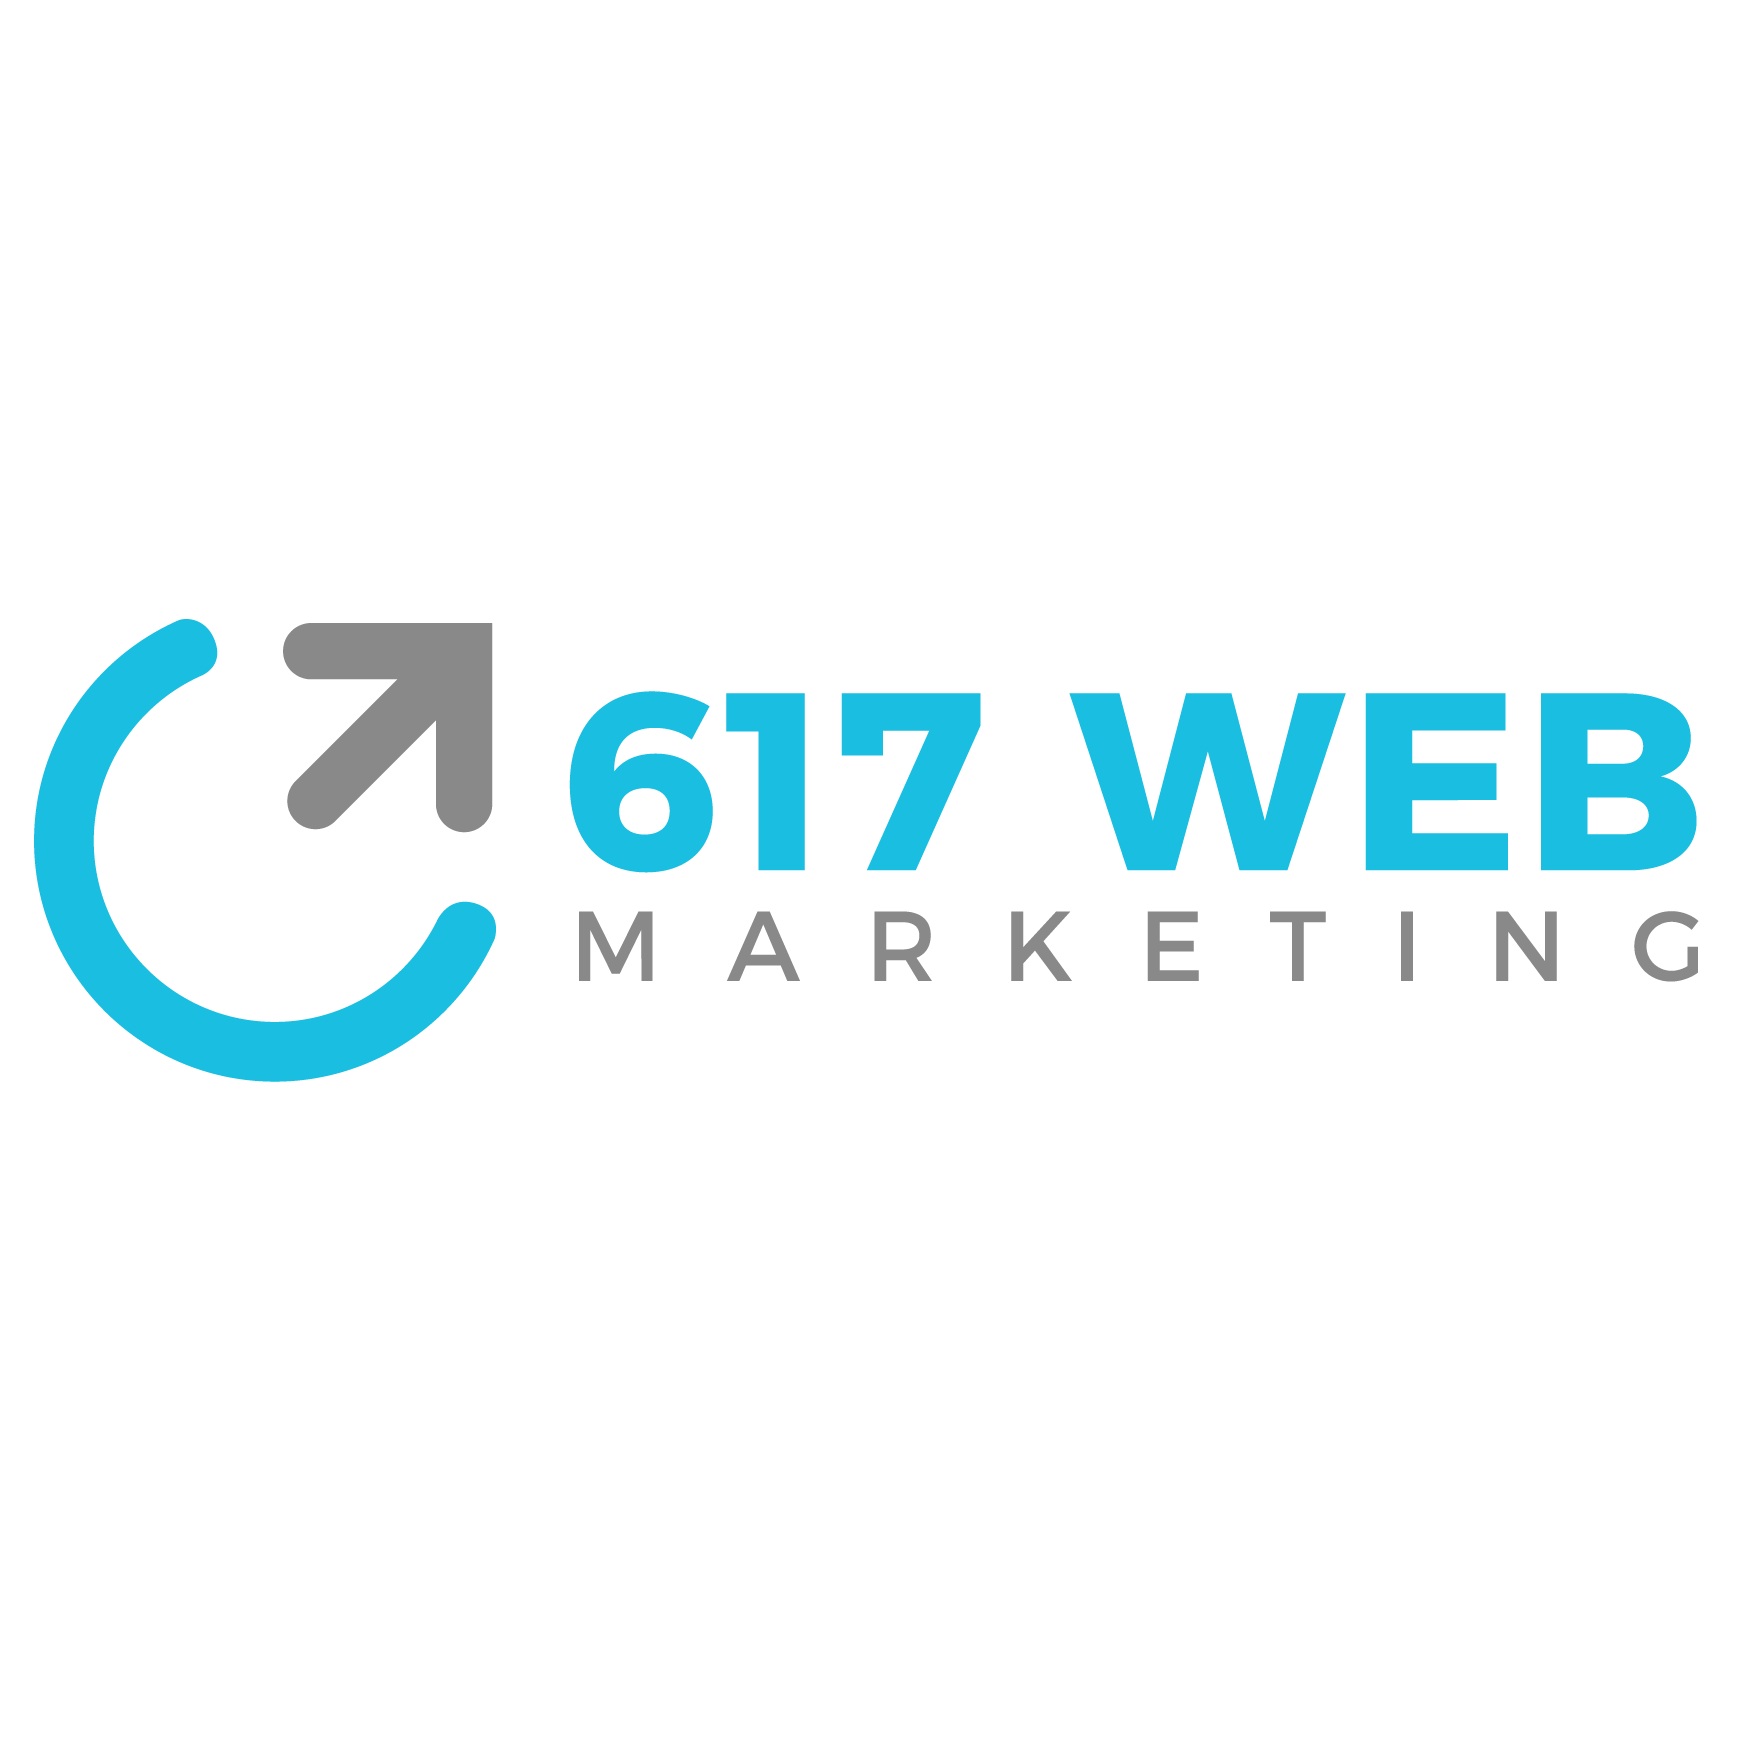 617 Web Marketing